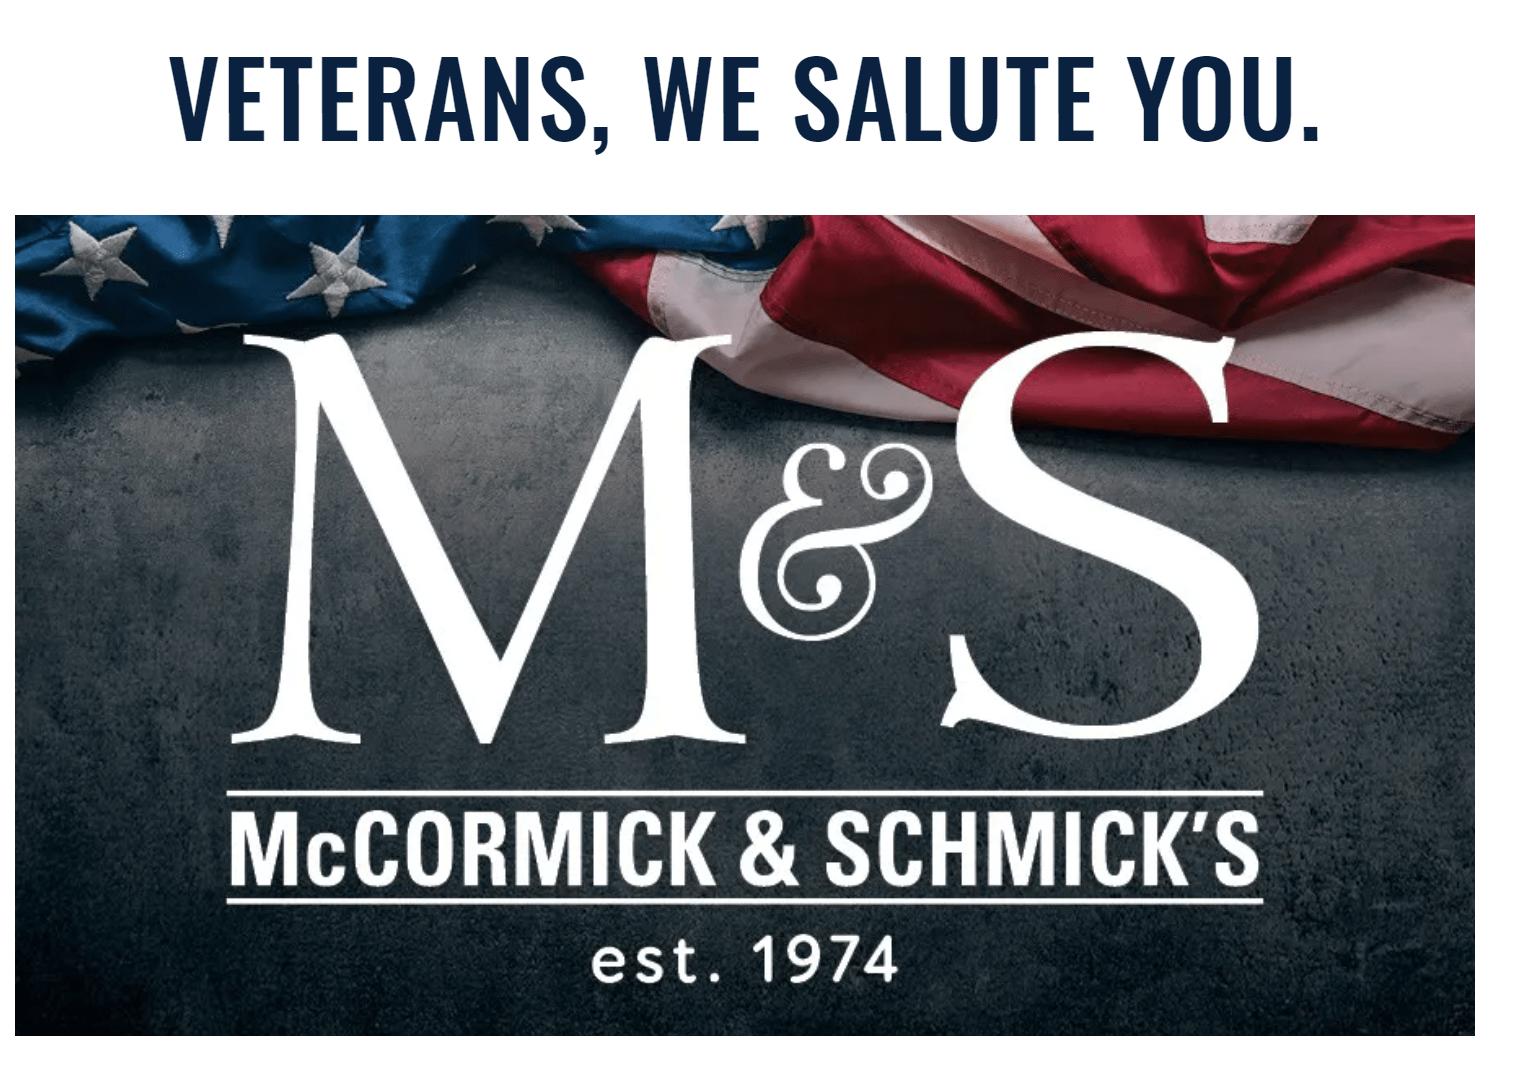 McCormick and Schmicks flyer